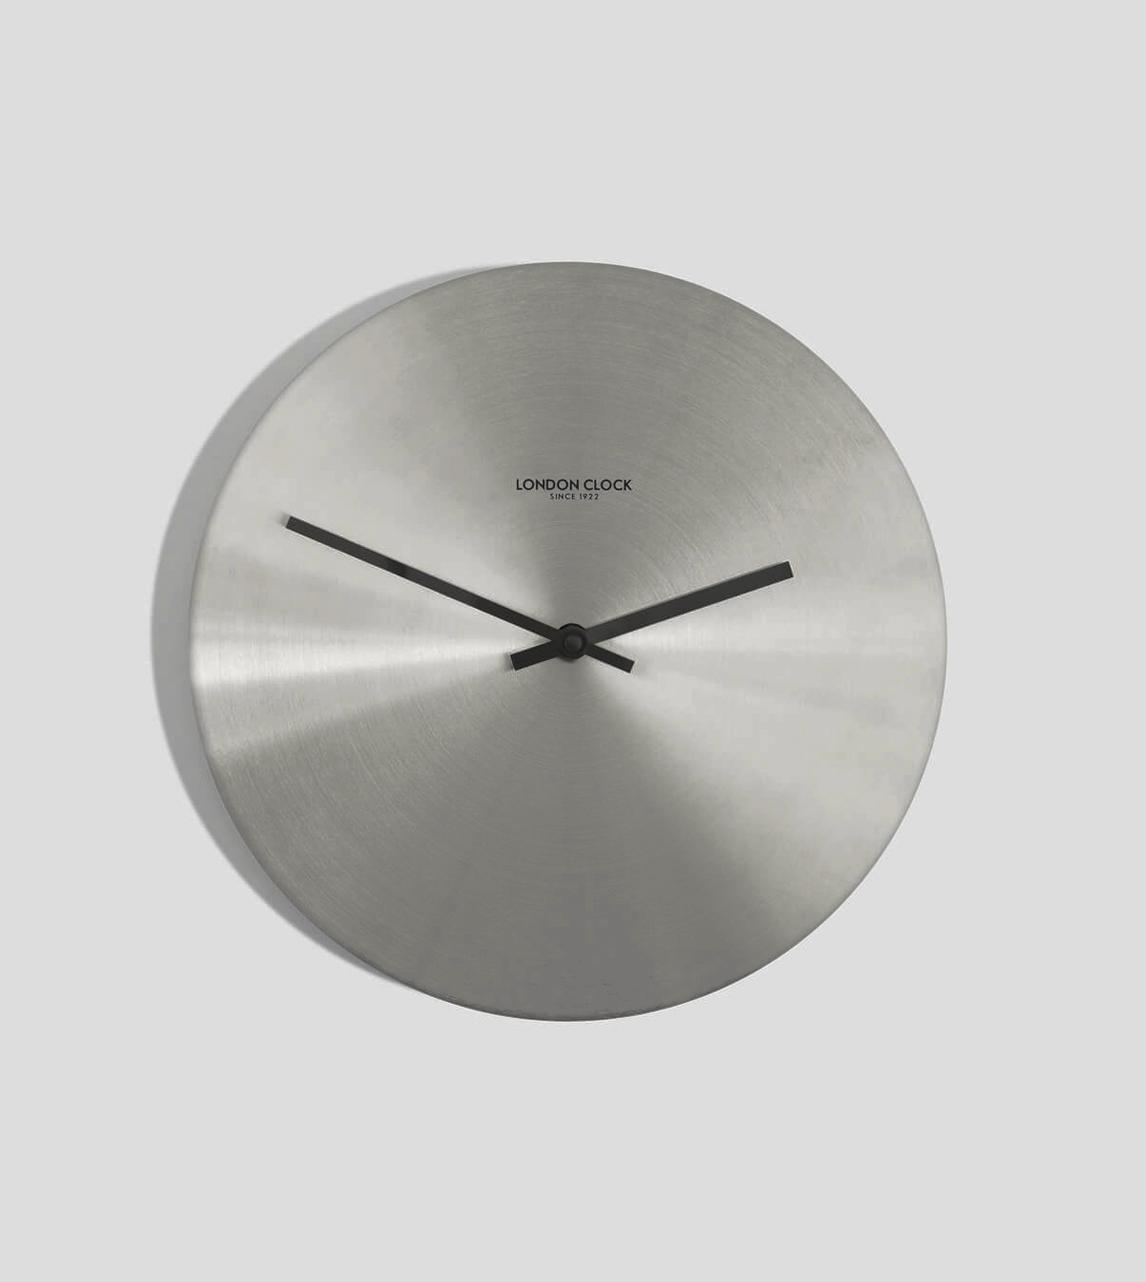 London Clock Alloy Silver London Clock Company Swoon